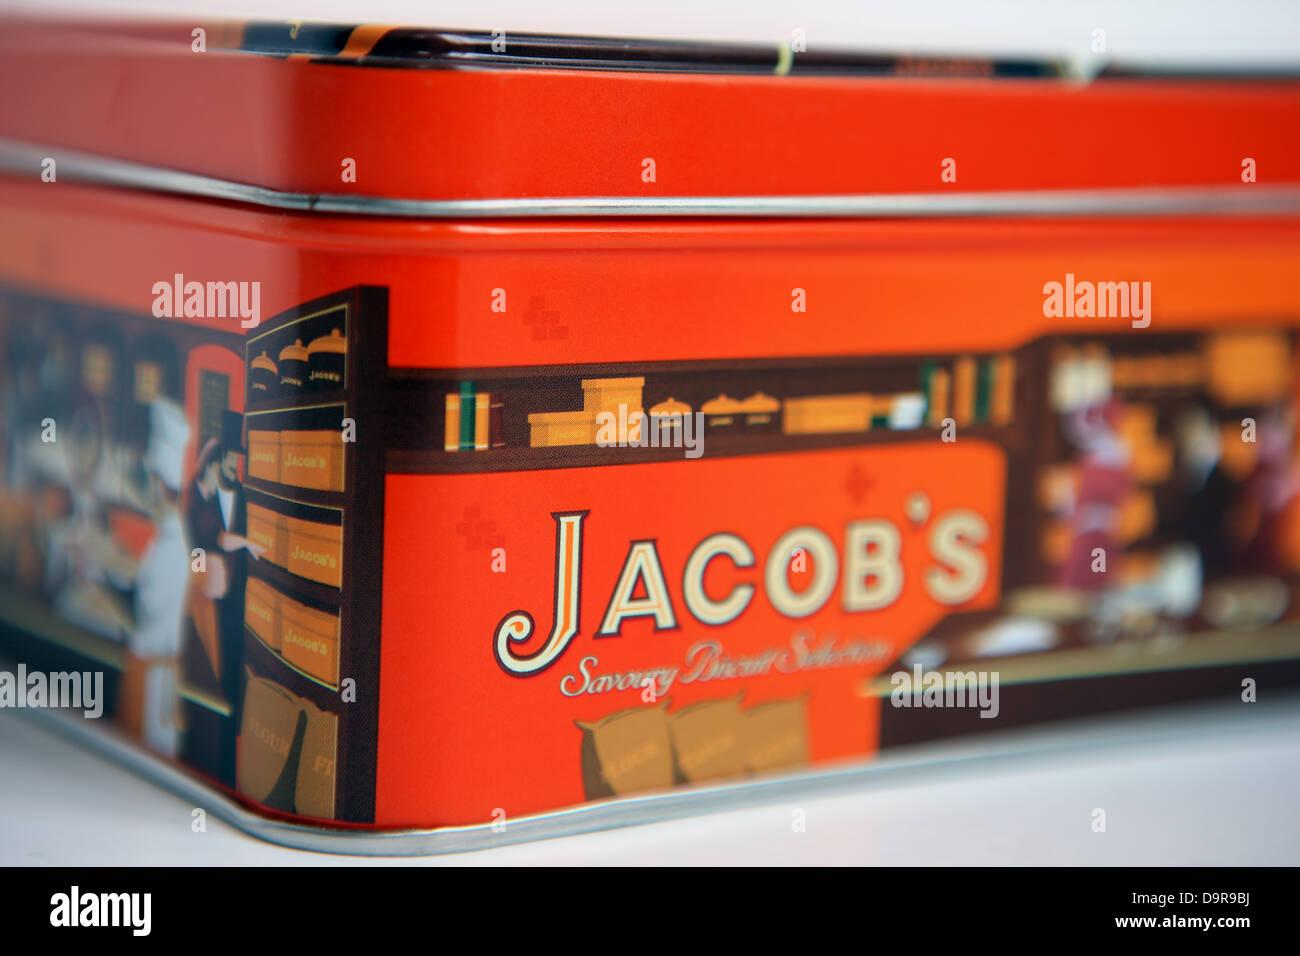 Tin of Jacob's savoury cracker selection - Stock Image